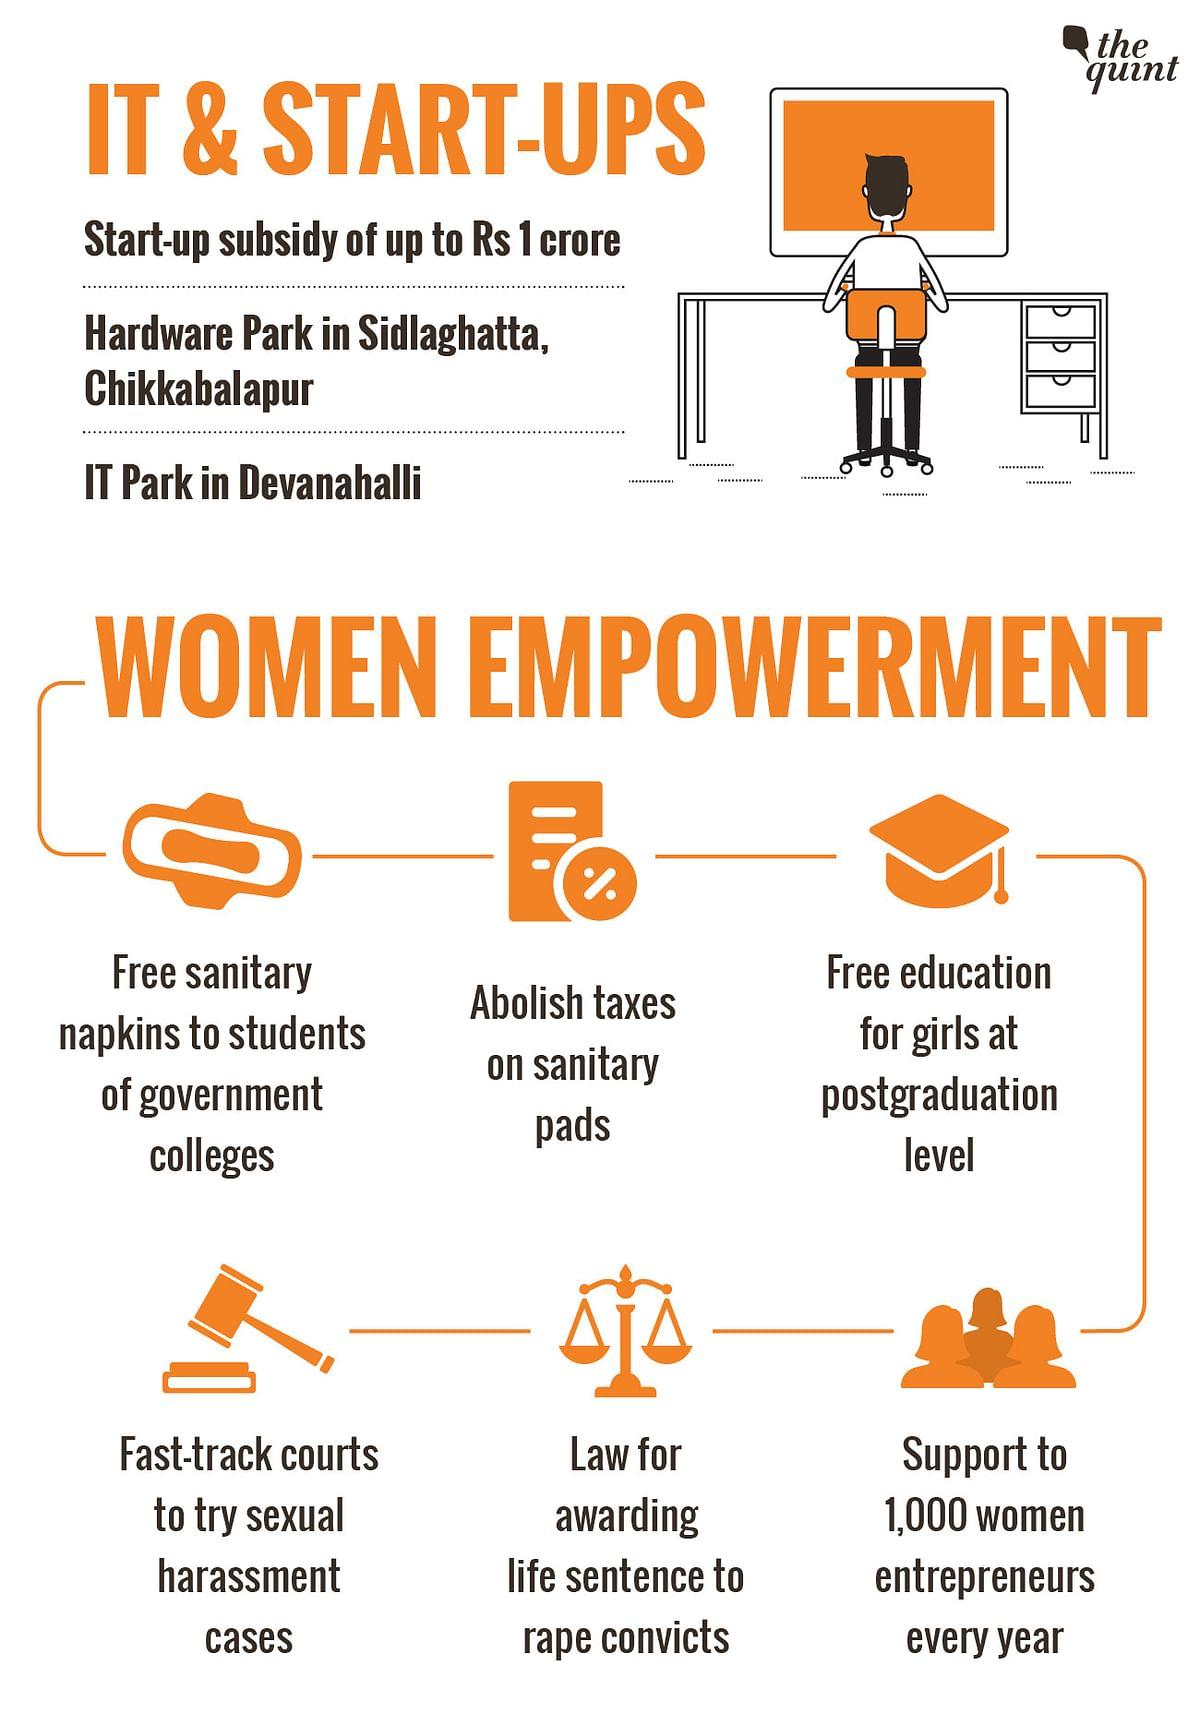 IT and Women Empowerment